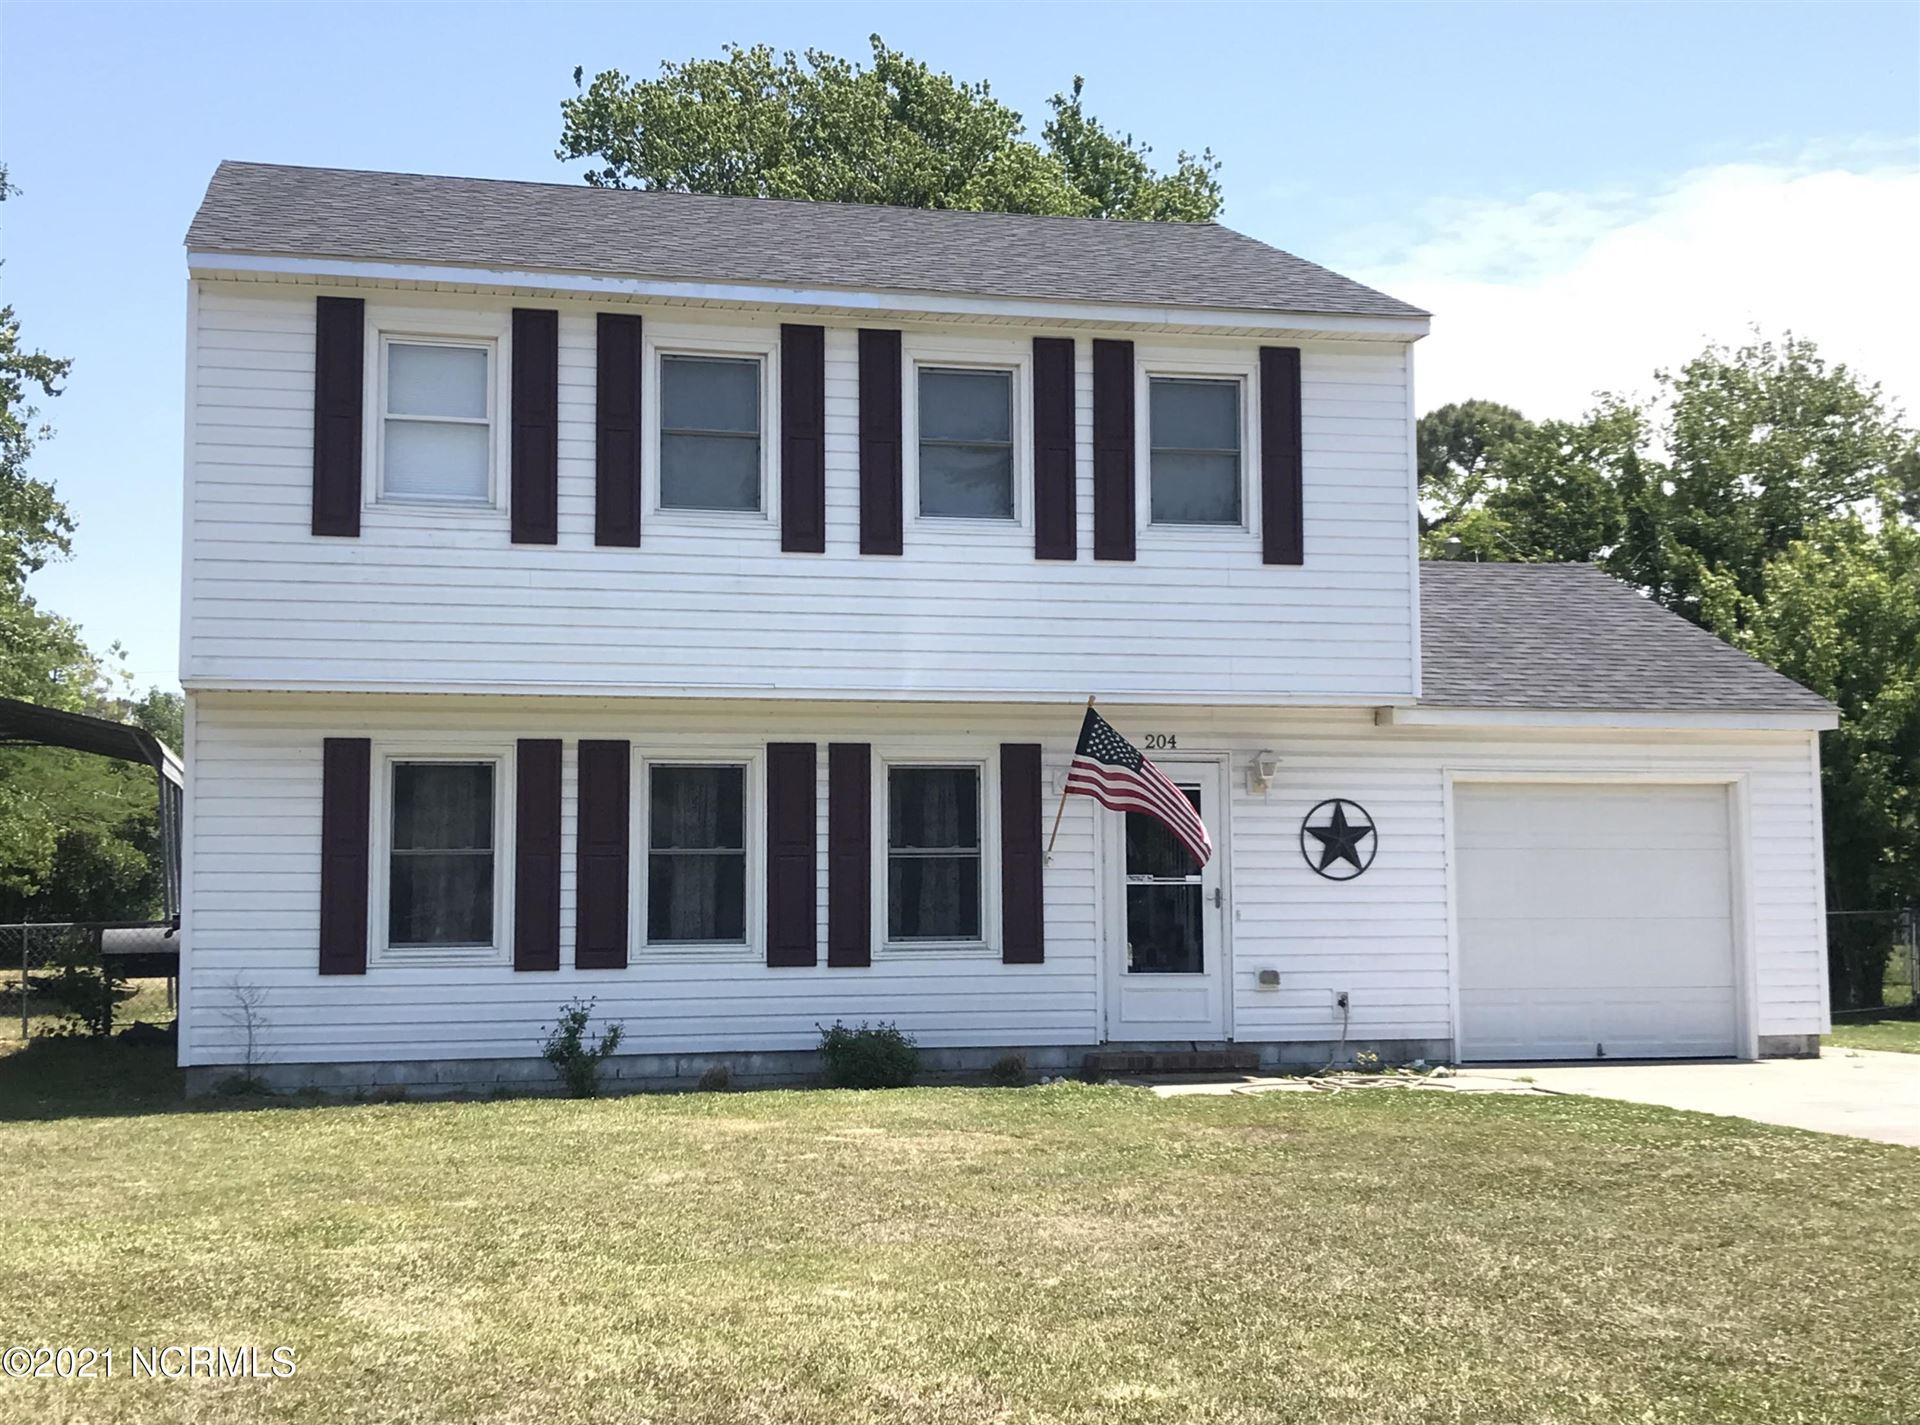 Photo of 204 Murdoch Road, Newport, NC 28570 (MLS # 100274332)